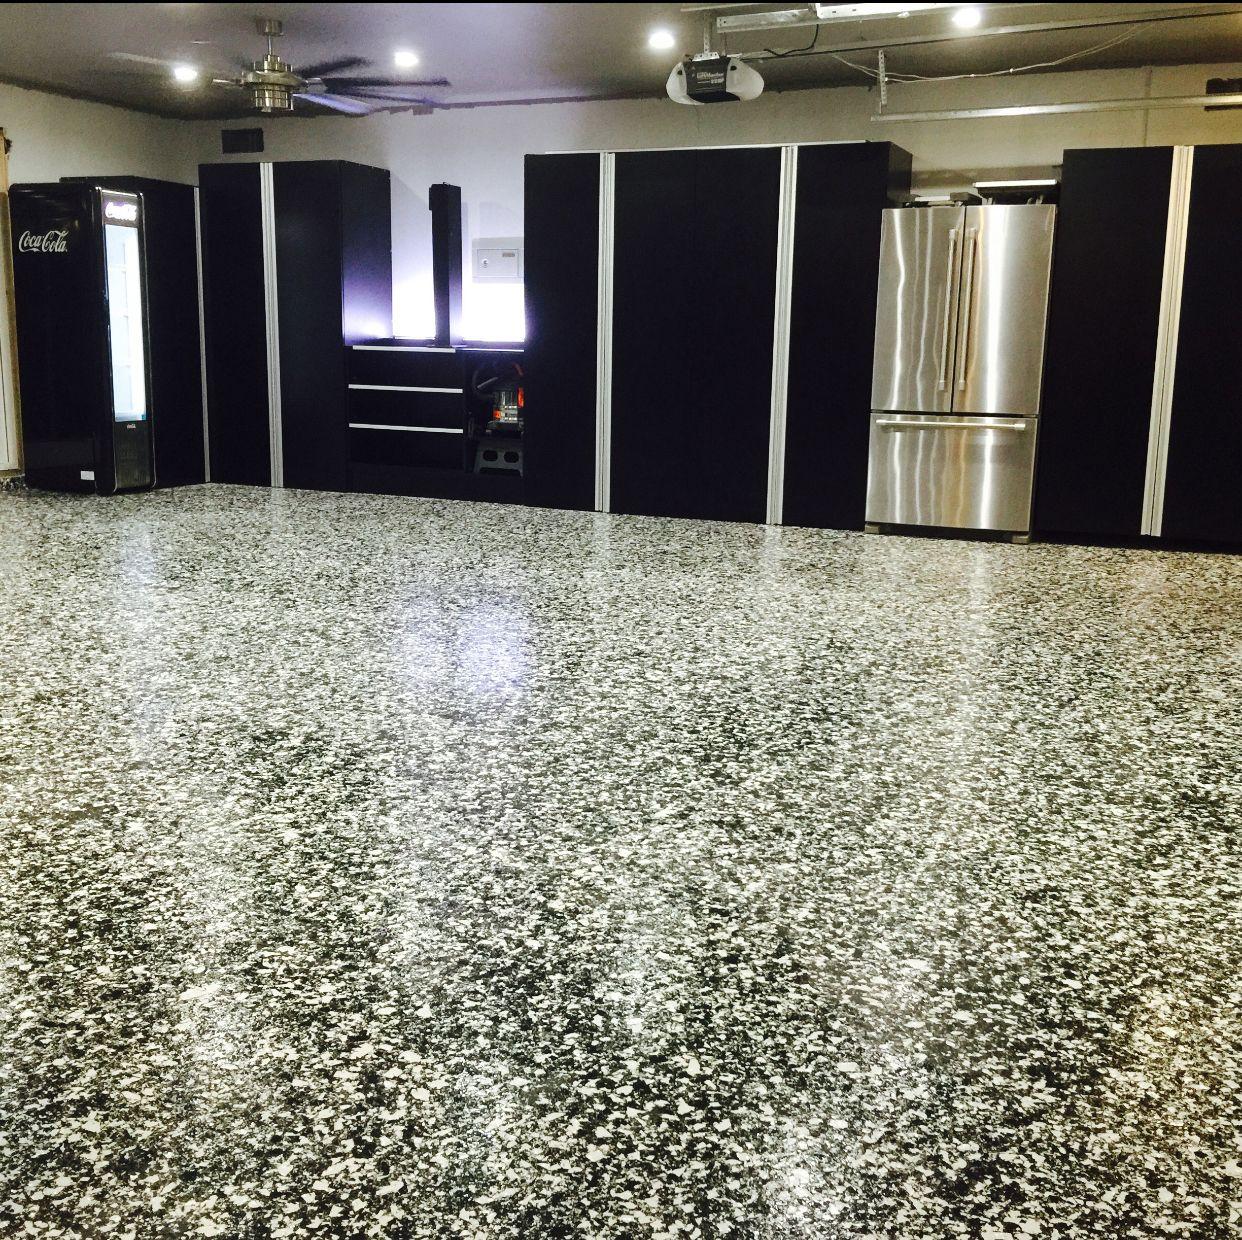 Garage Epoxy Floor Coating: 3rd Place $50 Winning Photo